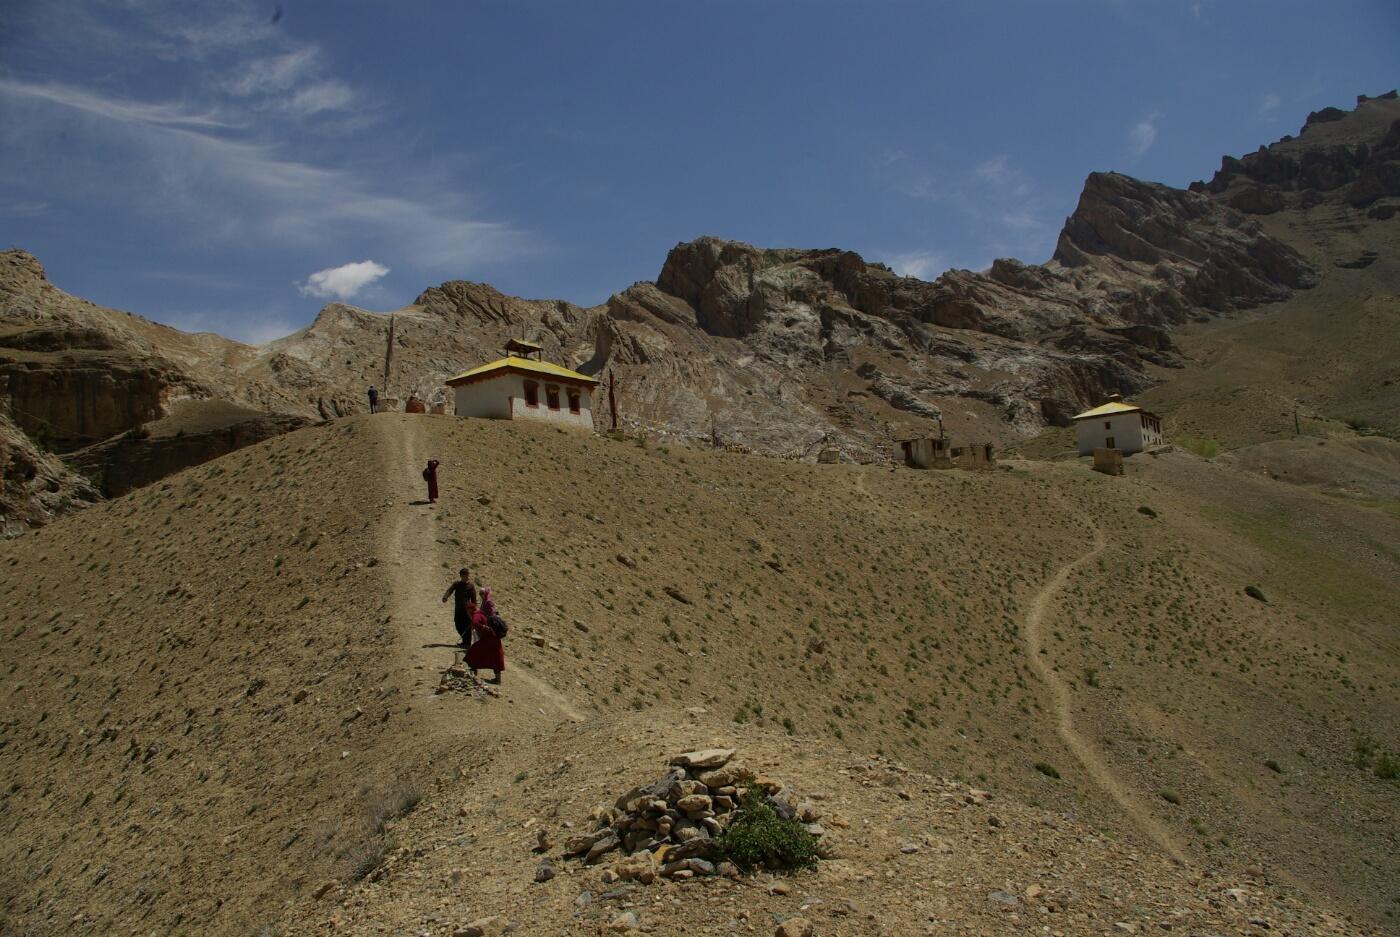 Phokar, Padmasambhava: Letzter Anstieg auf den Höhenzug..